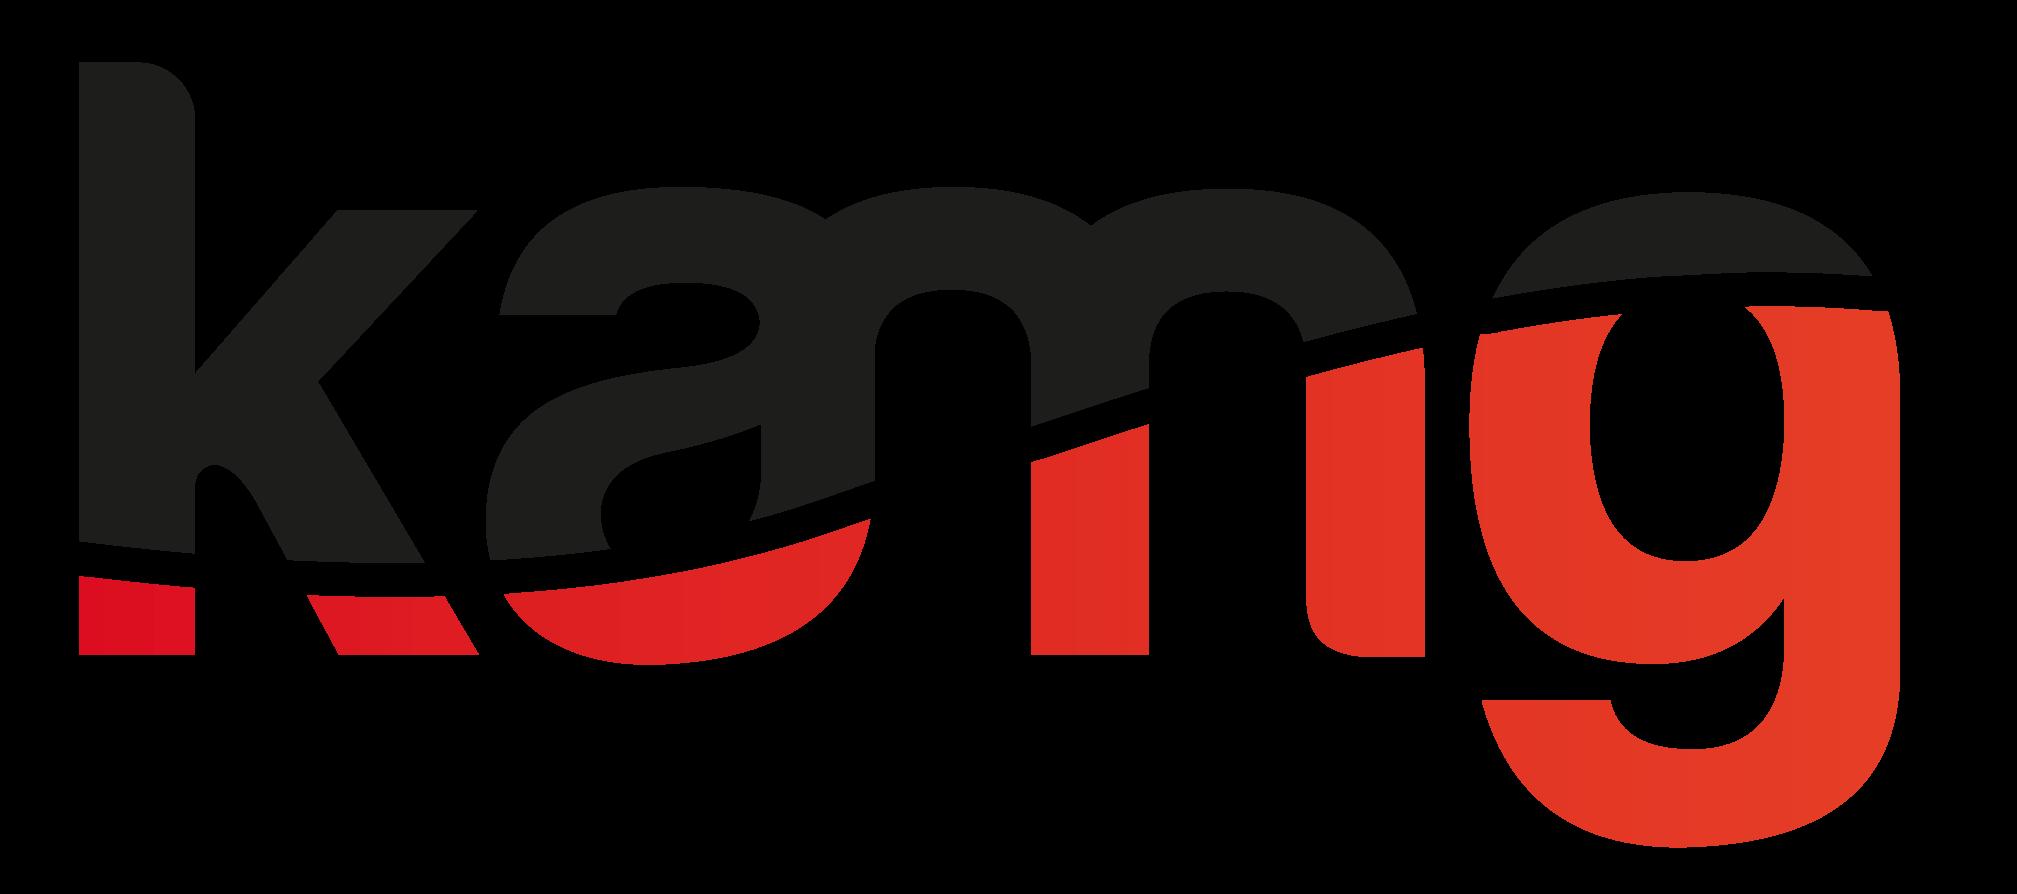 Kamg Logo Final 01